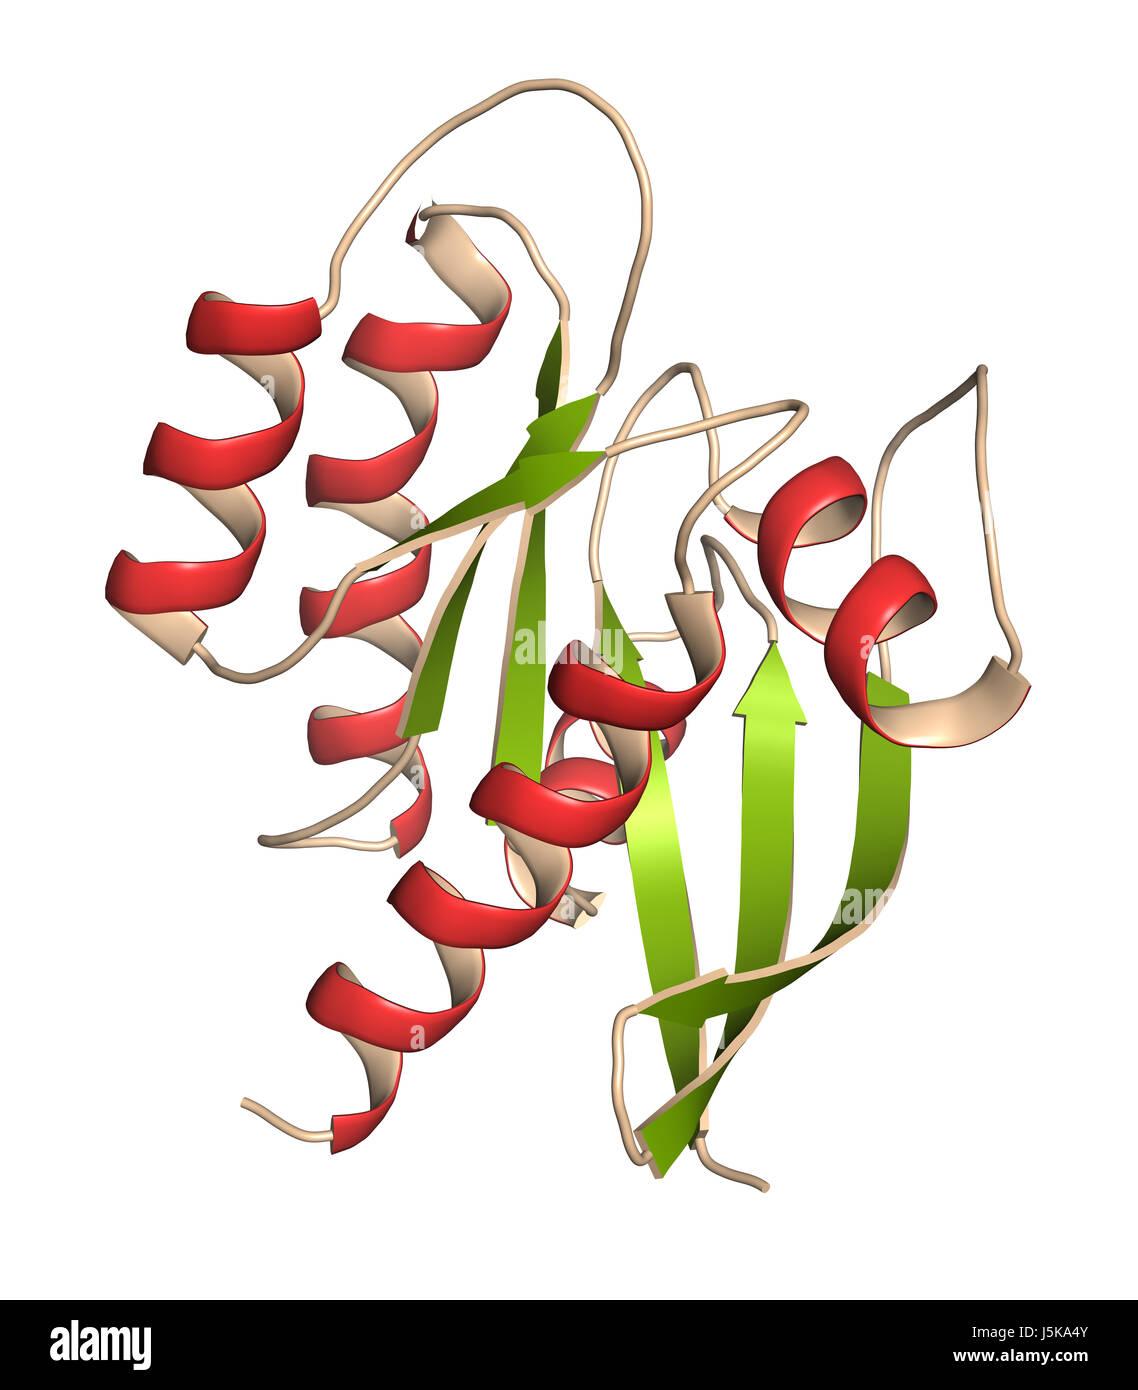 KRAS (Kirsten rat sarcoma viral oncogene homolog, fragment) protein. 3D rendering based on protein data bank entry - Stock Image